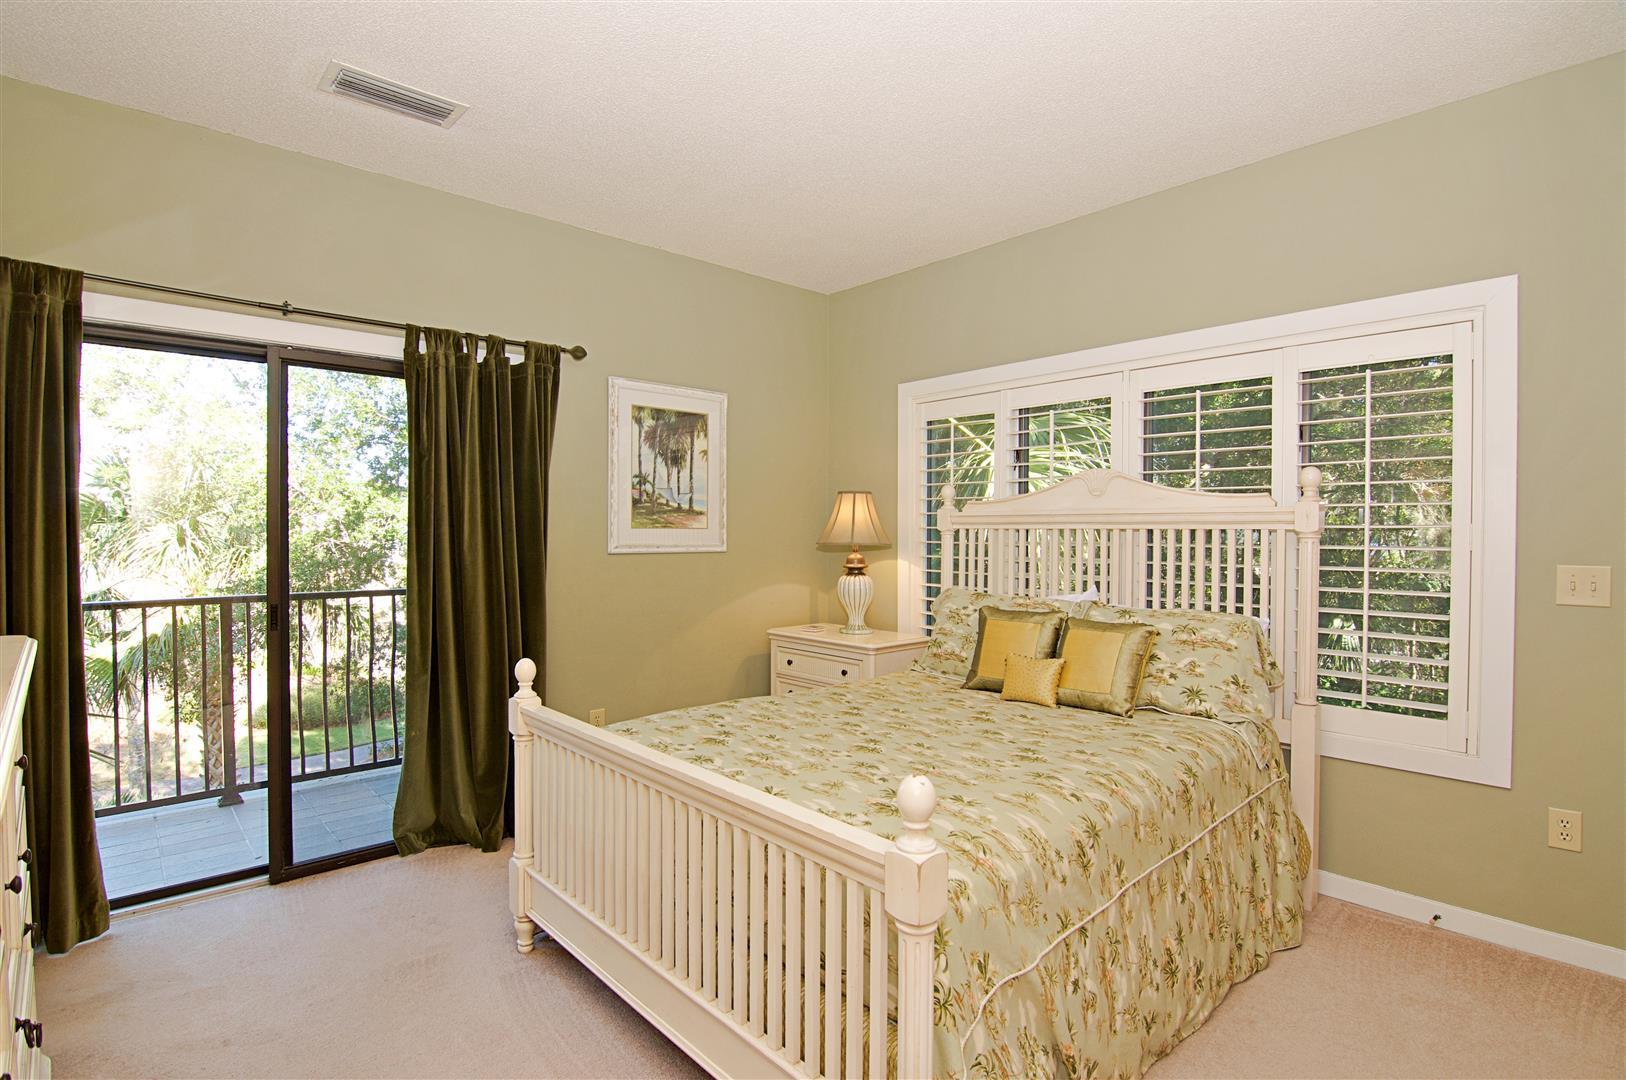 Seabrook Island Homes For Sale - 3020 Ocean Winds, Seabrook Island, SC - 25